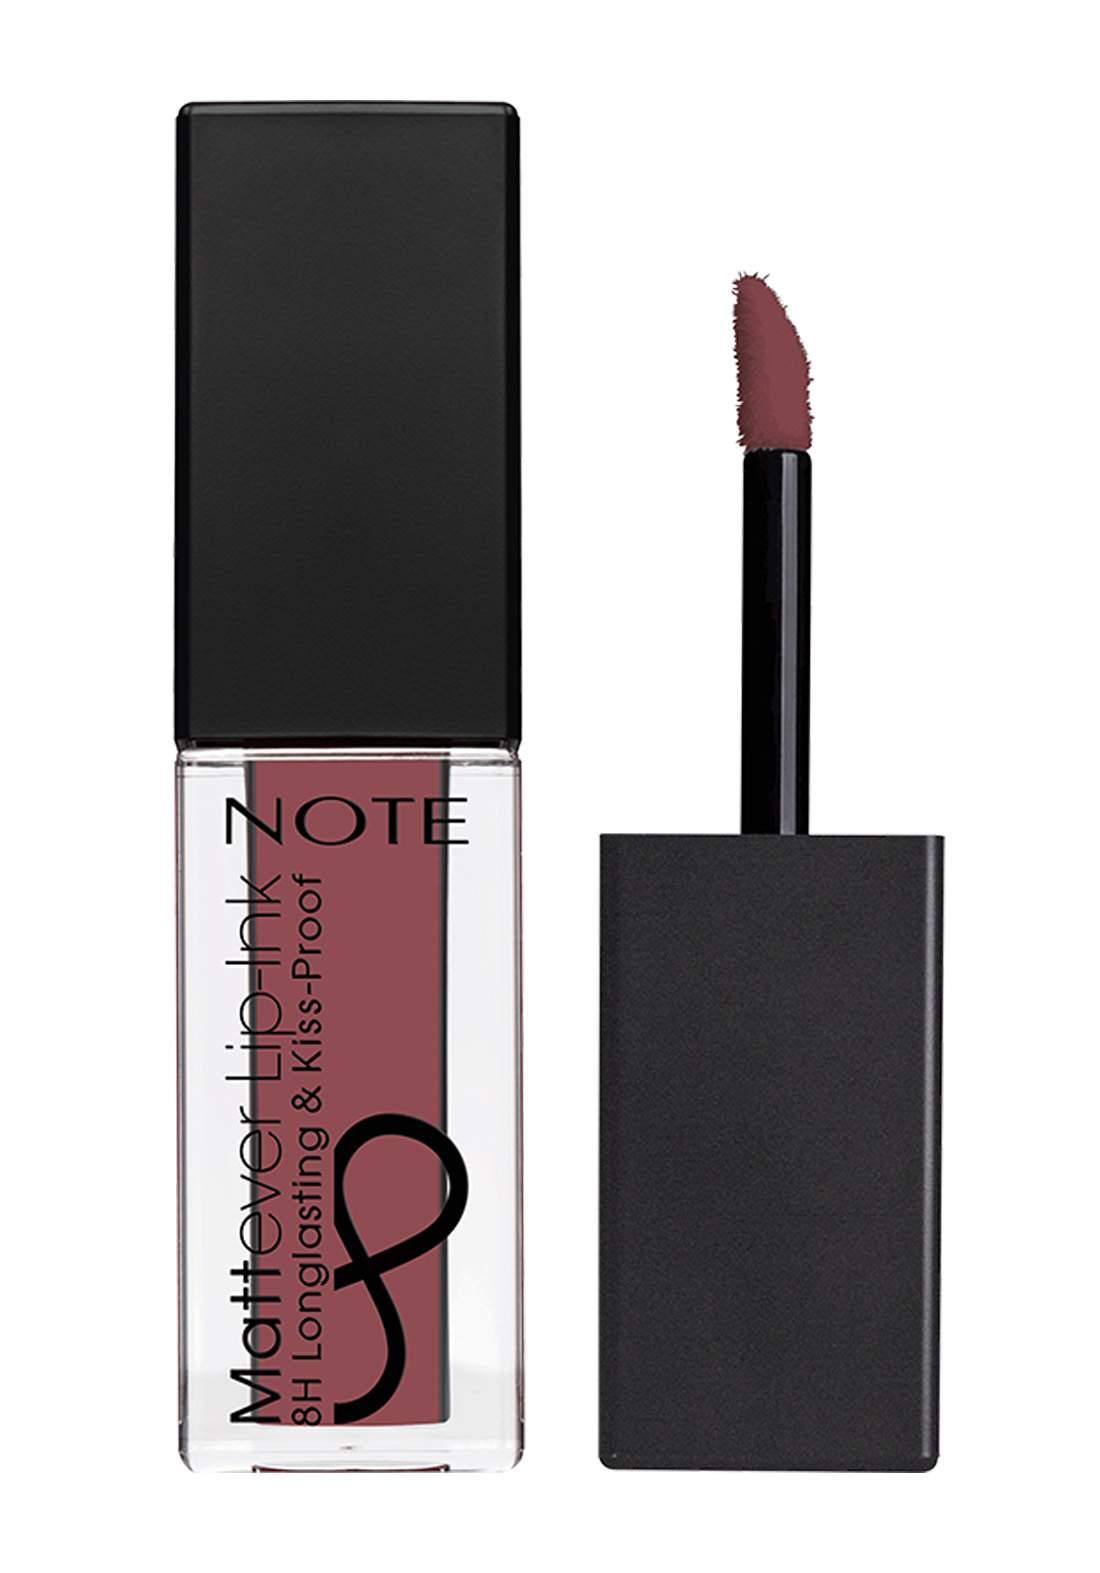 Note Cosmetics Mattever Lip Ink No.07 Mouve On 4.5ml احمر شفاه